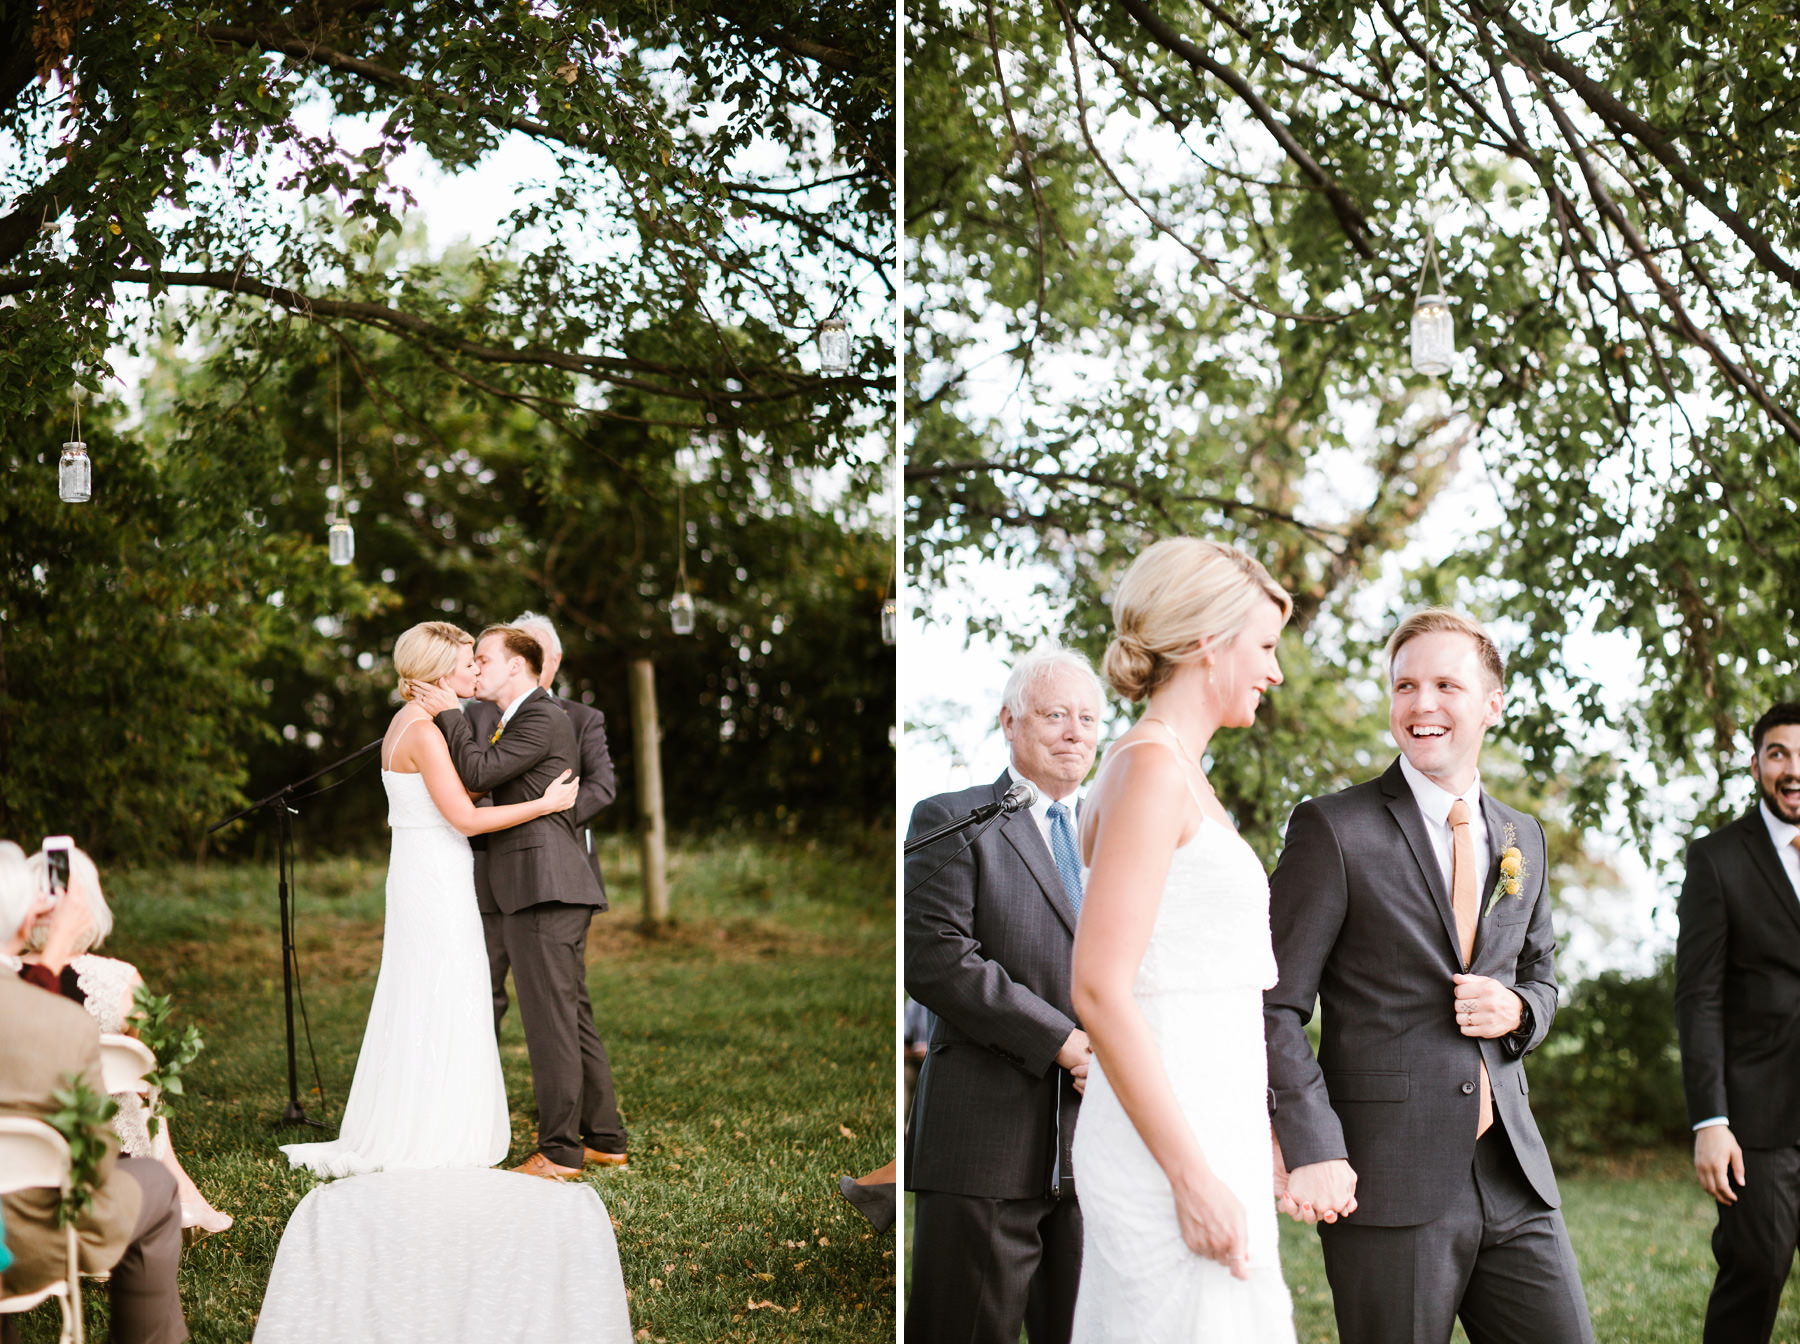 Alldredge Orchard Kansas City_Kindling Wedding Photography BLOG 46.JPG